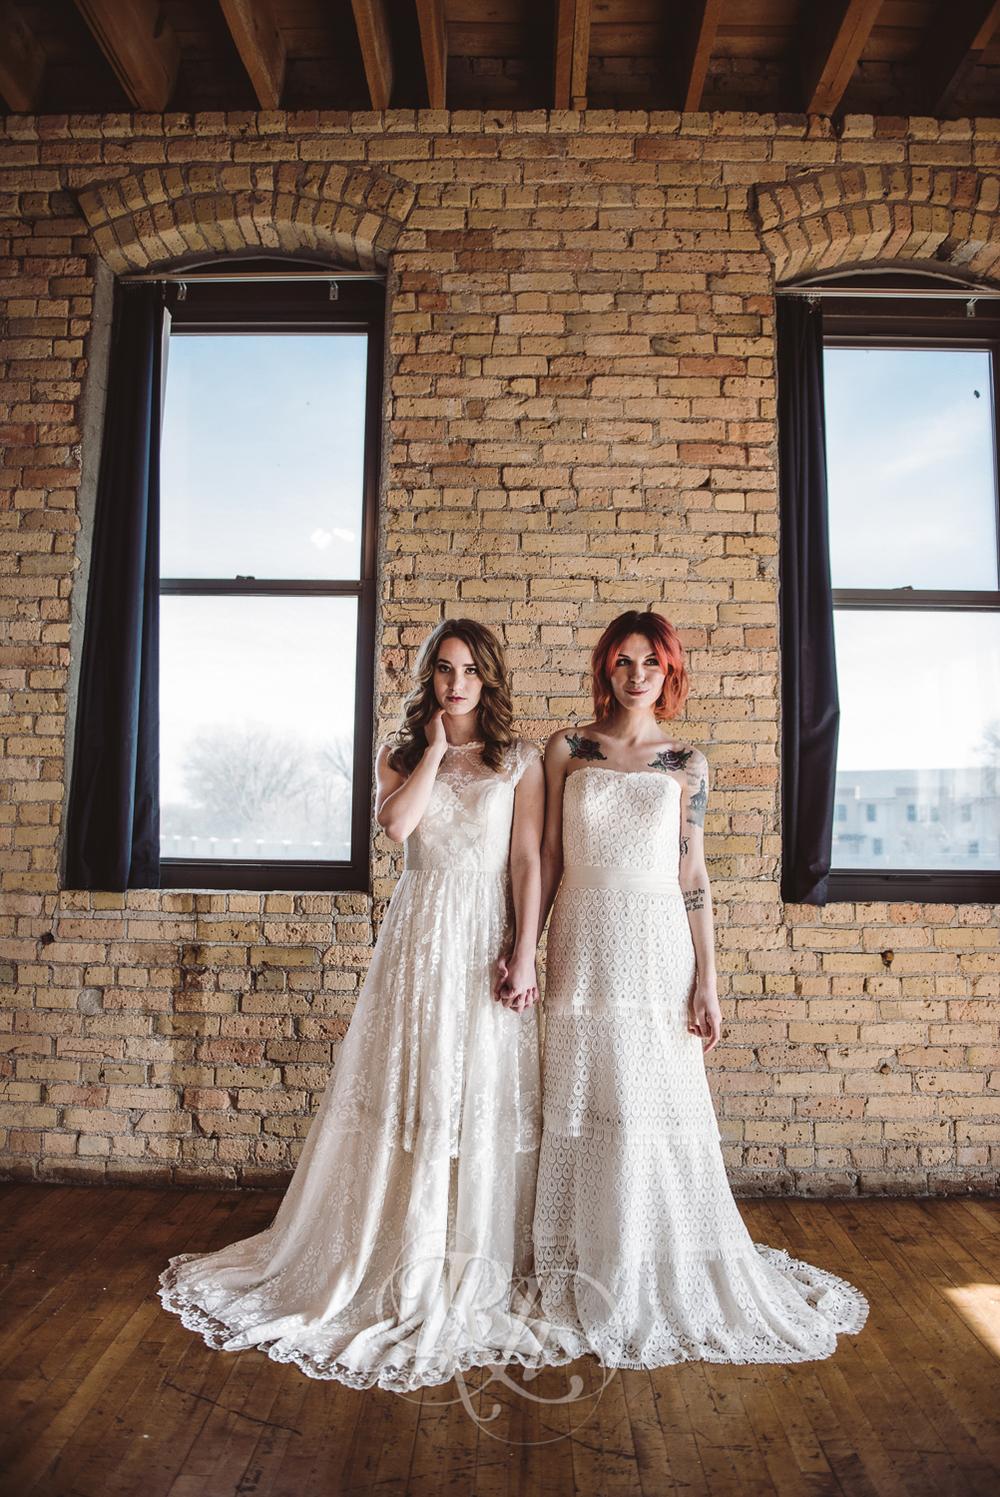 Minneapolis Wedding Shoot - RKH Images - Minnesota Wedding Photographer - Samples-25